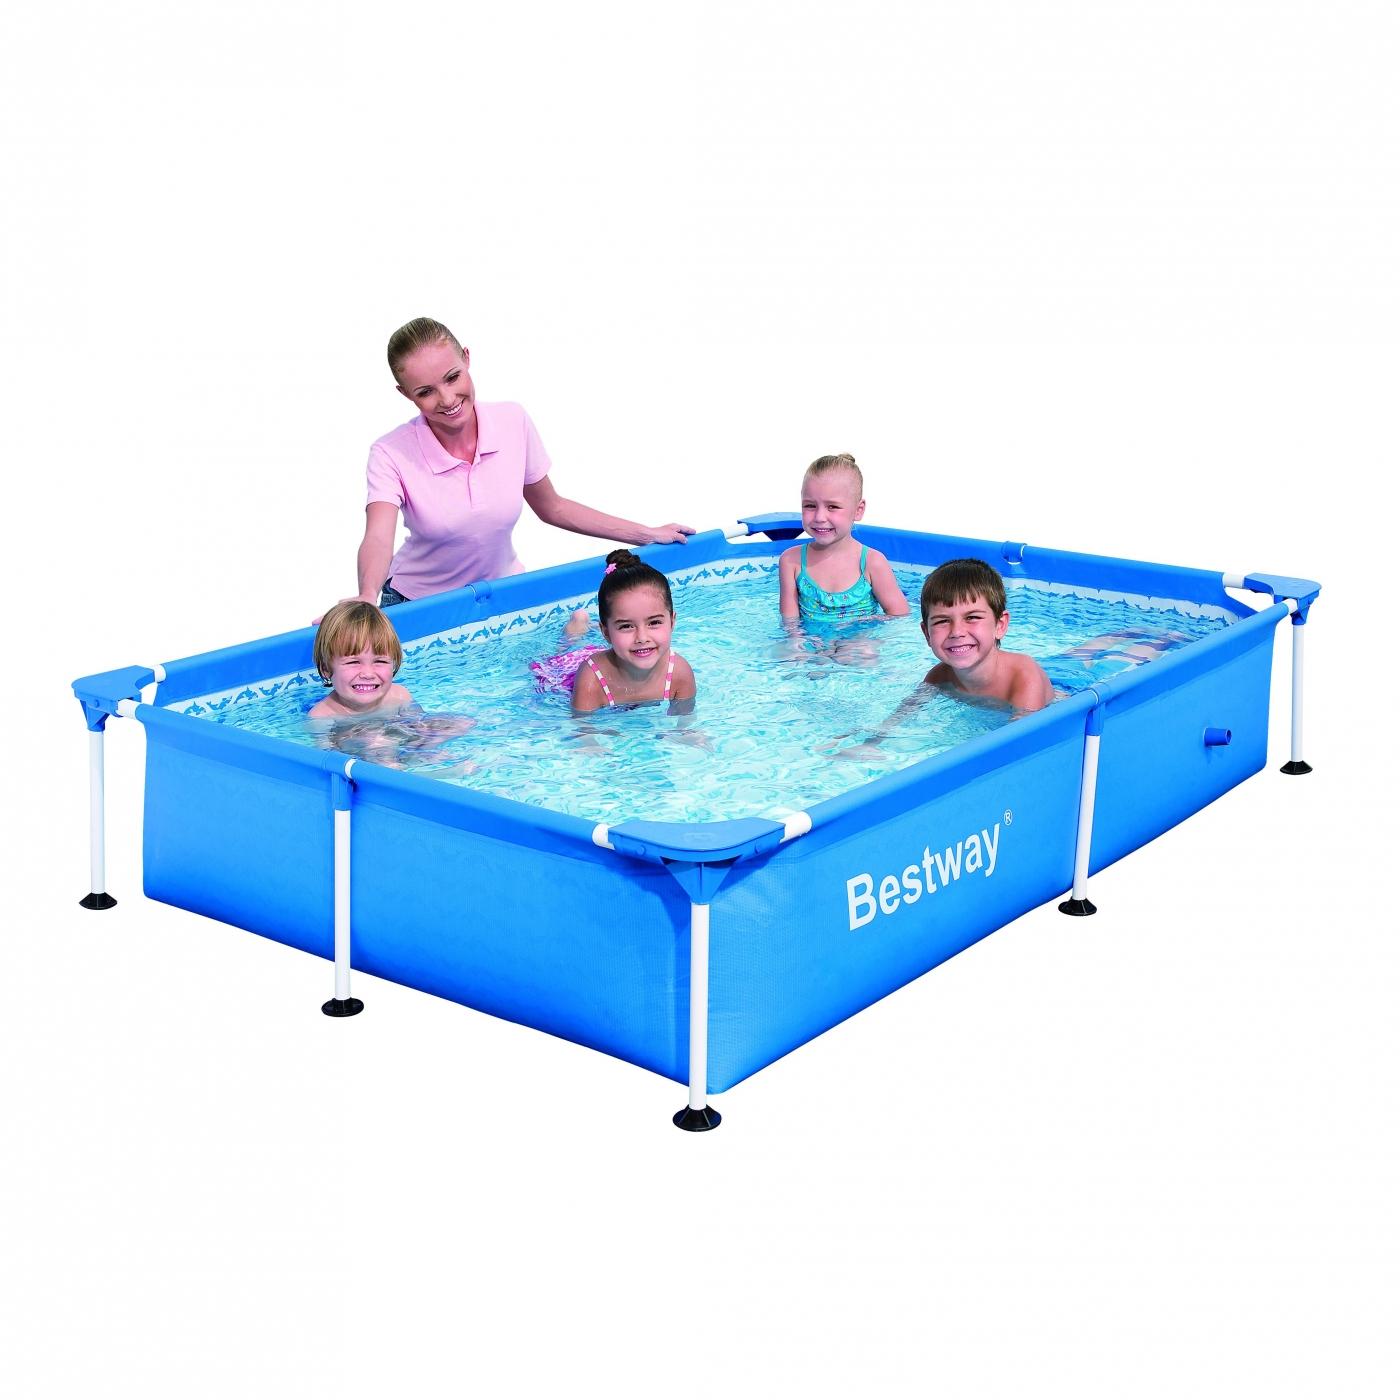 Piscina splash sin depuradora 229 x 160 x 43 cm por 75 00 for Piscinas bestway opiniones